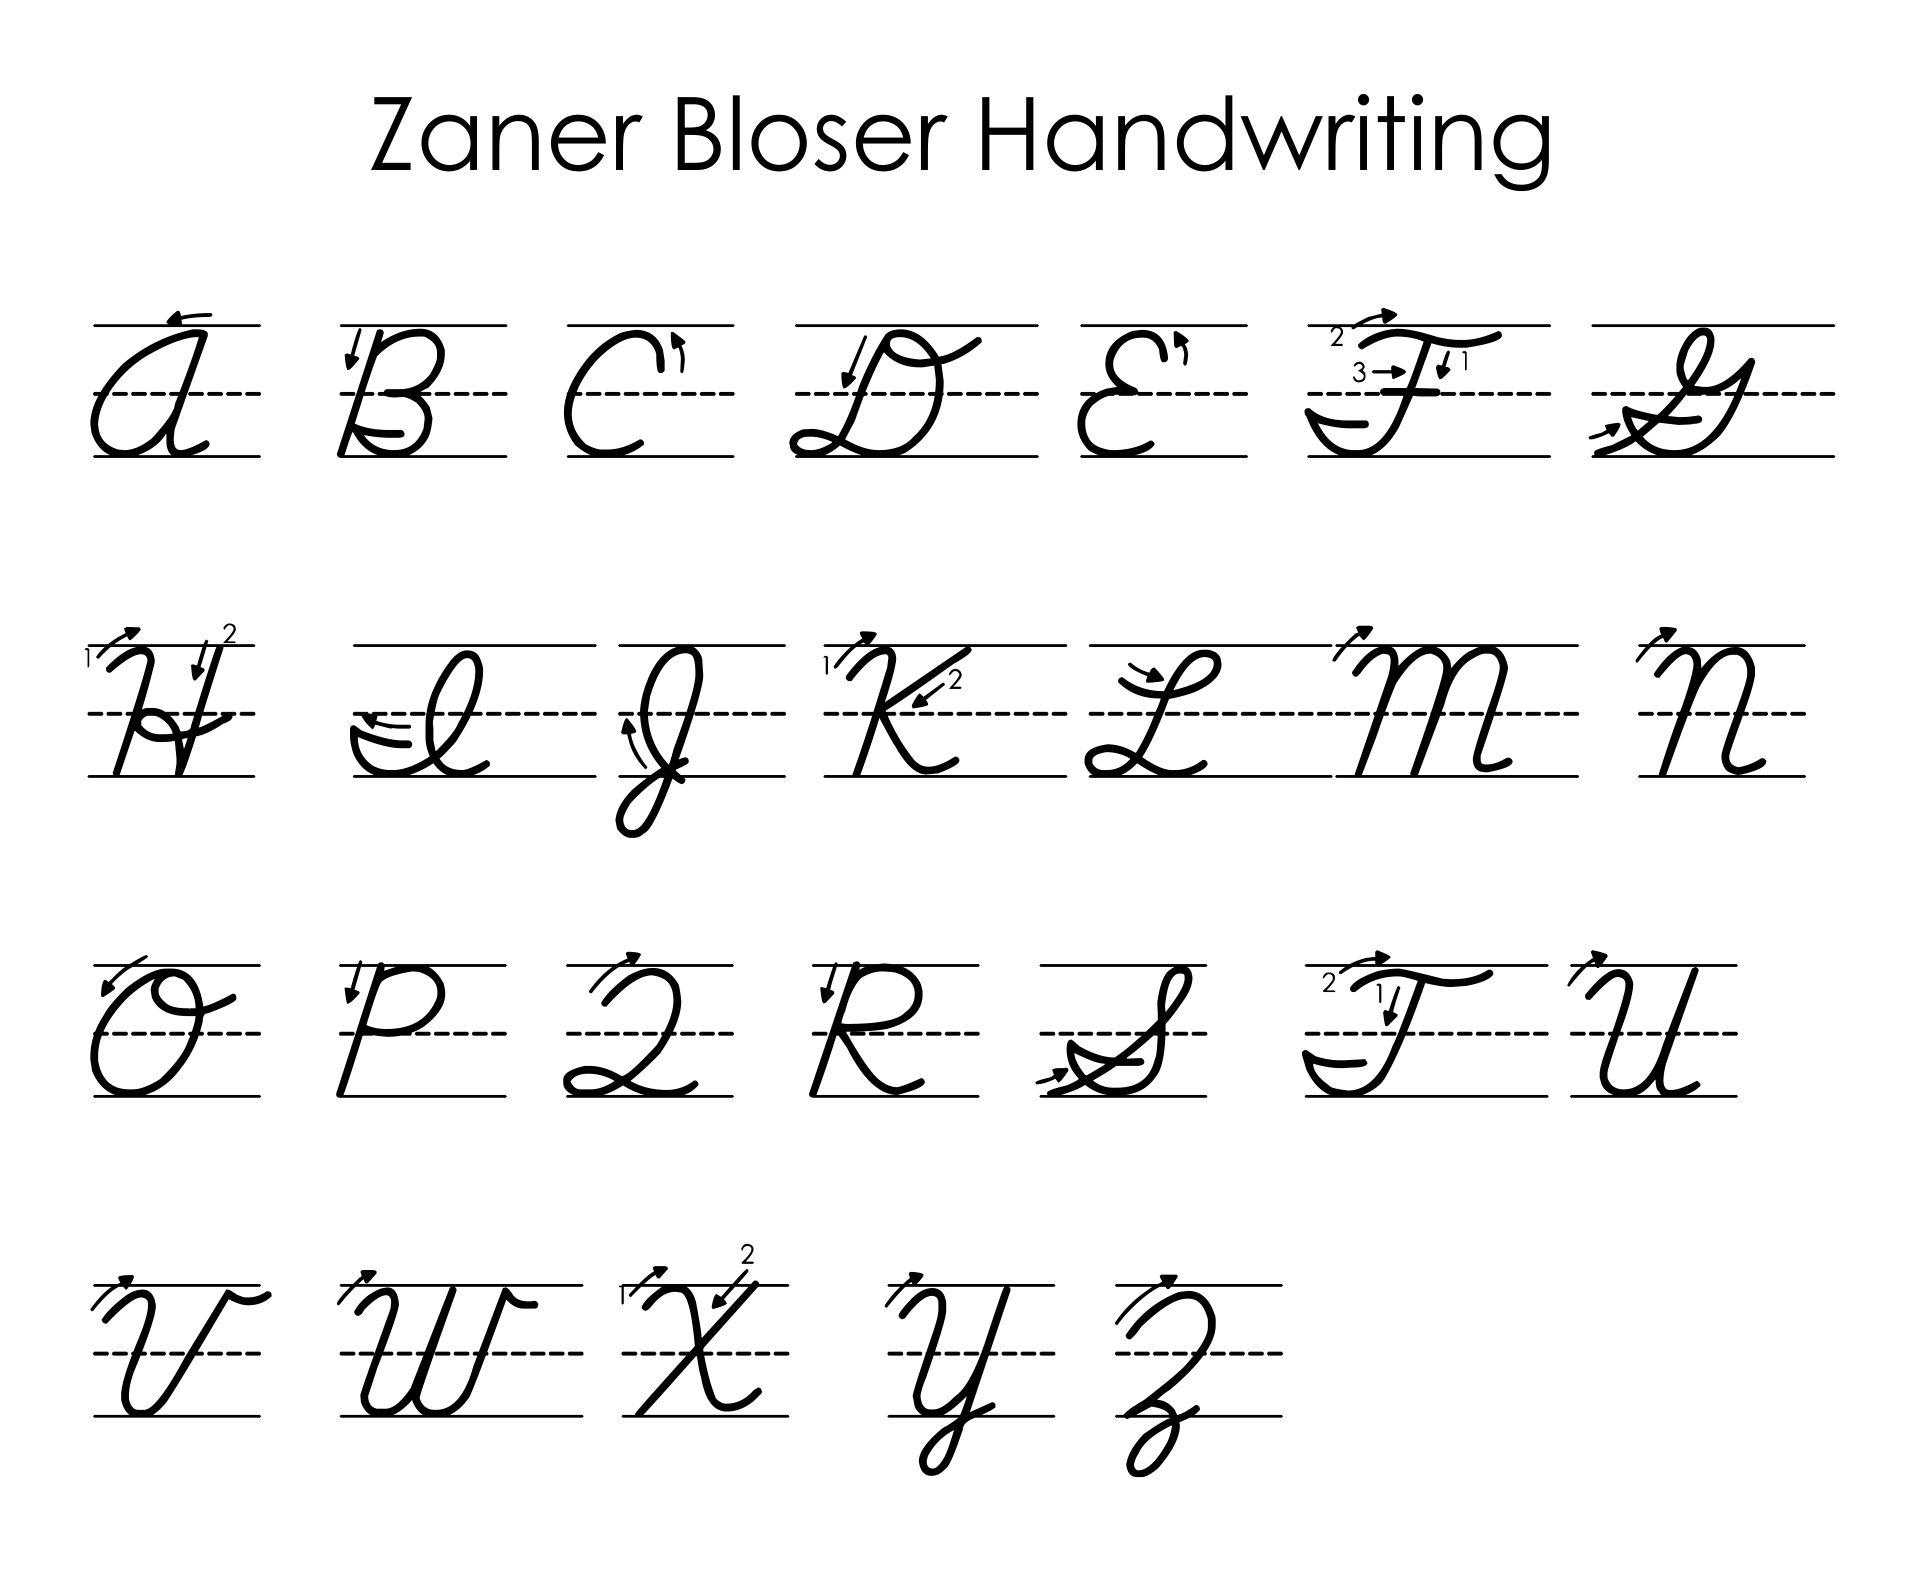 Zaner-Bloser Manuscript Alphabet Printable